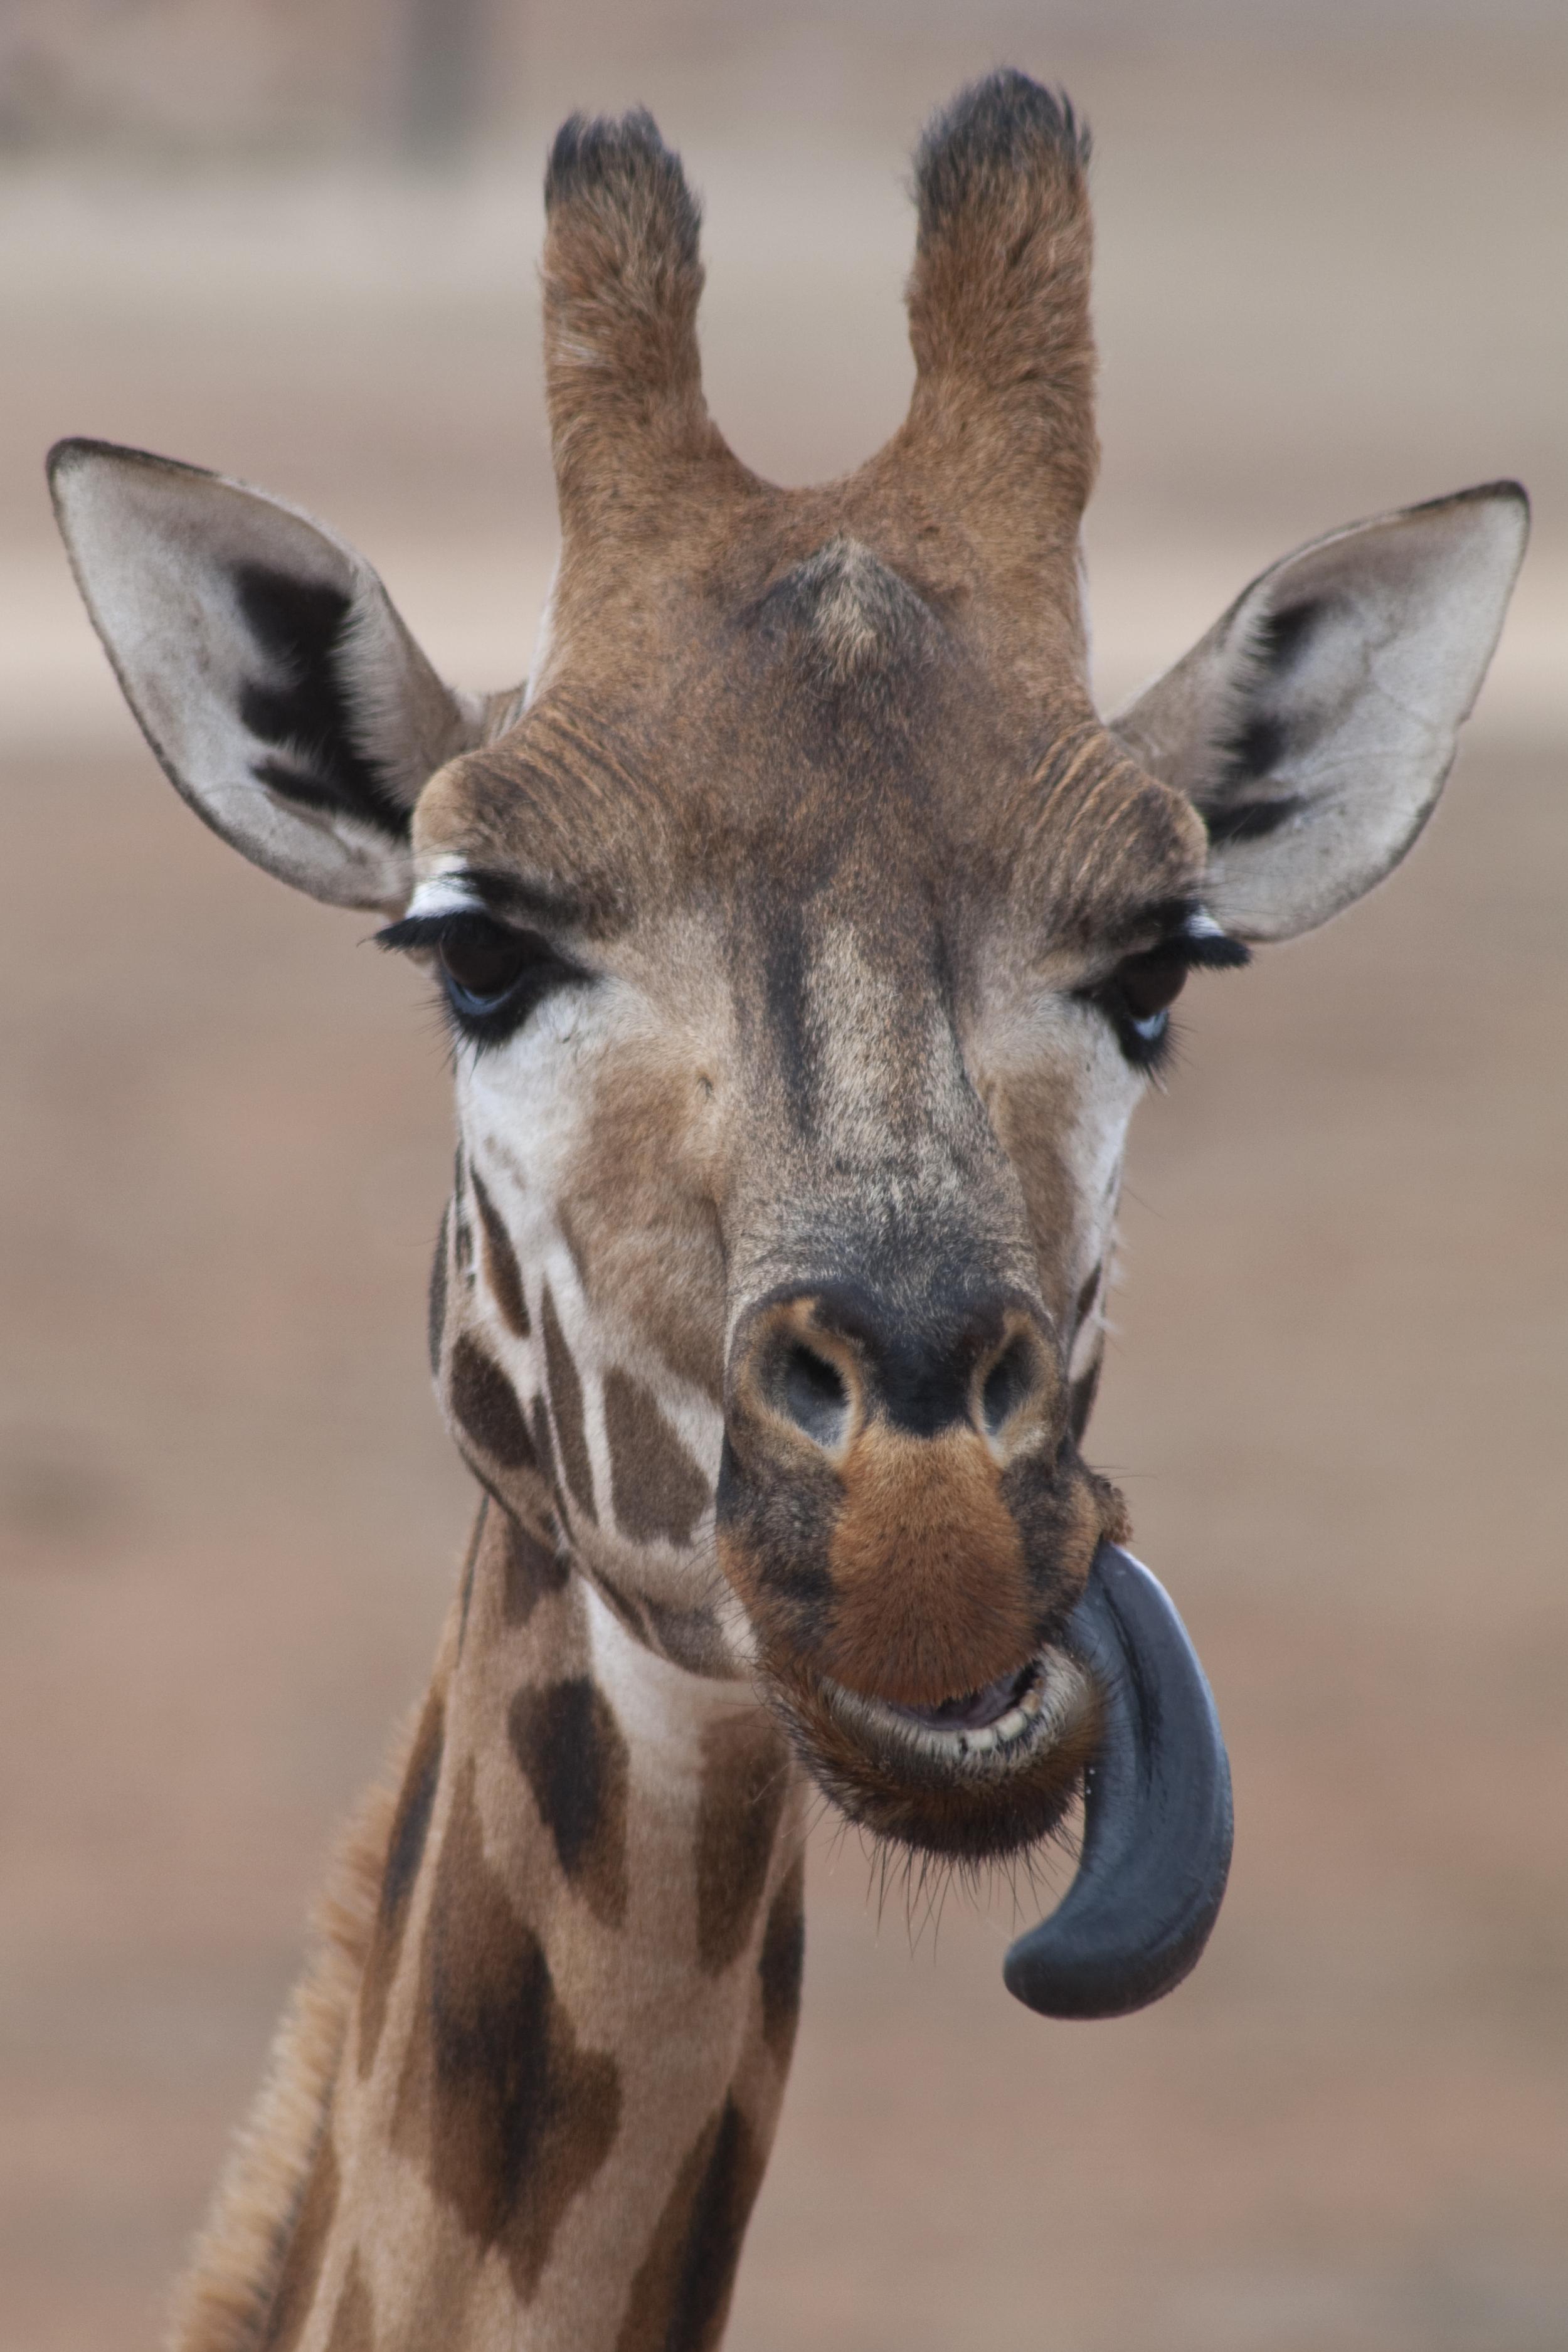 Giraffe tongue - photo#14